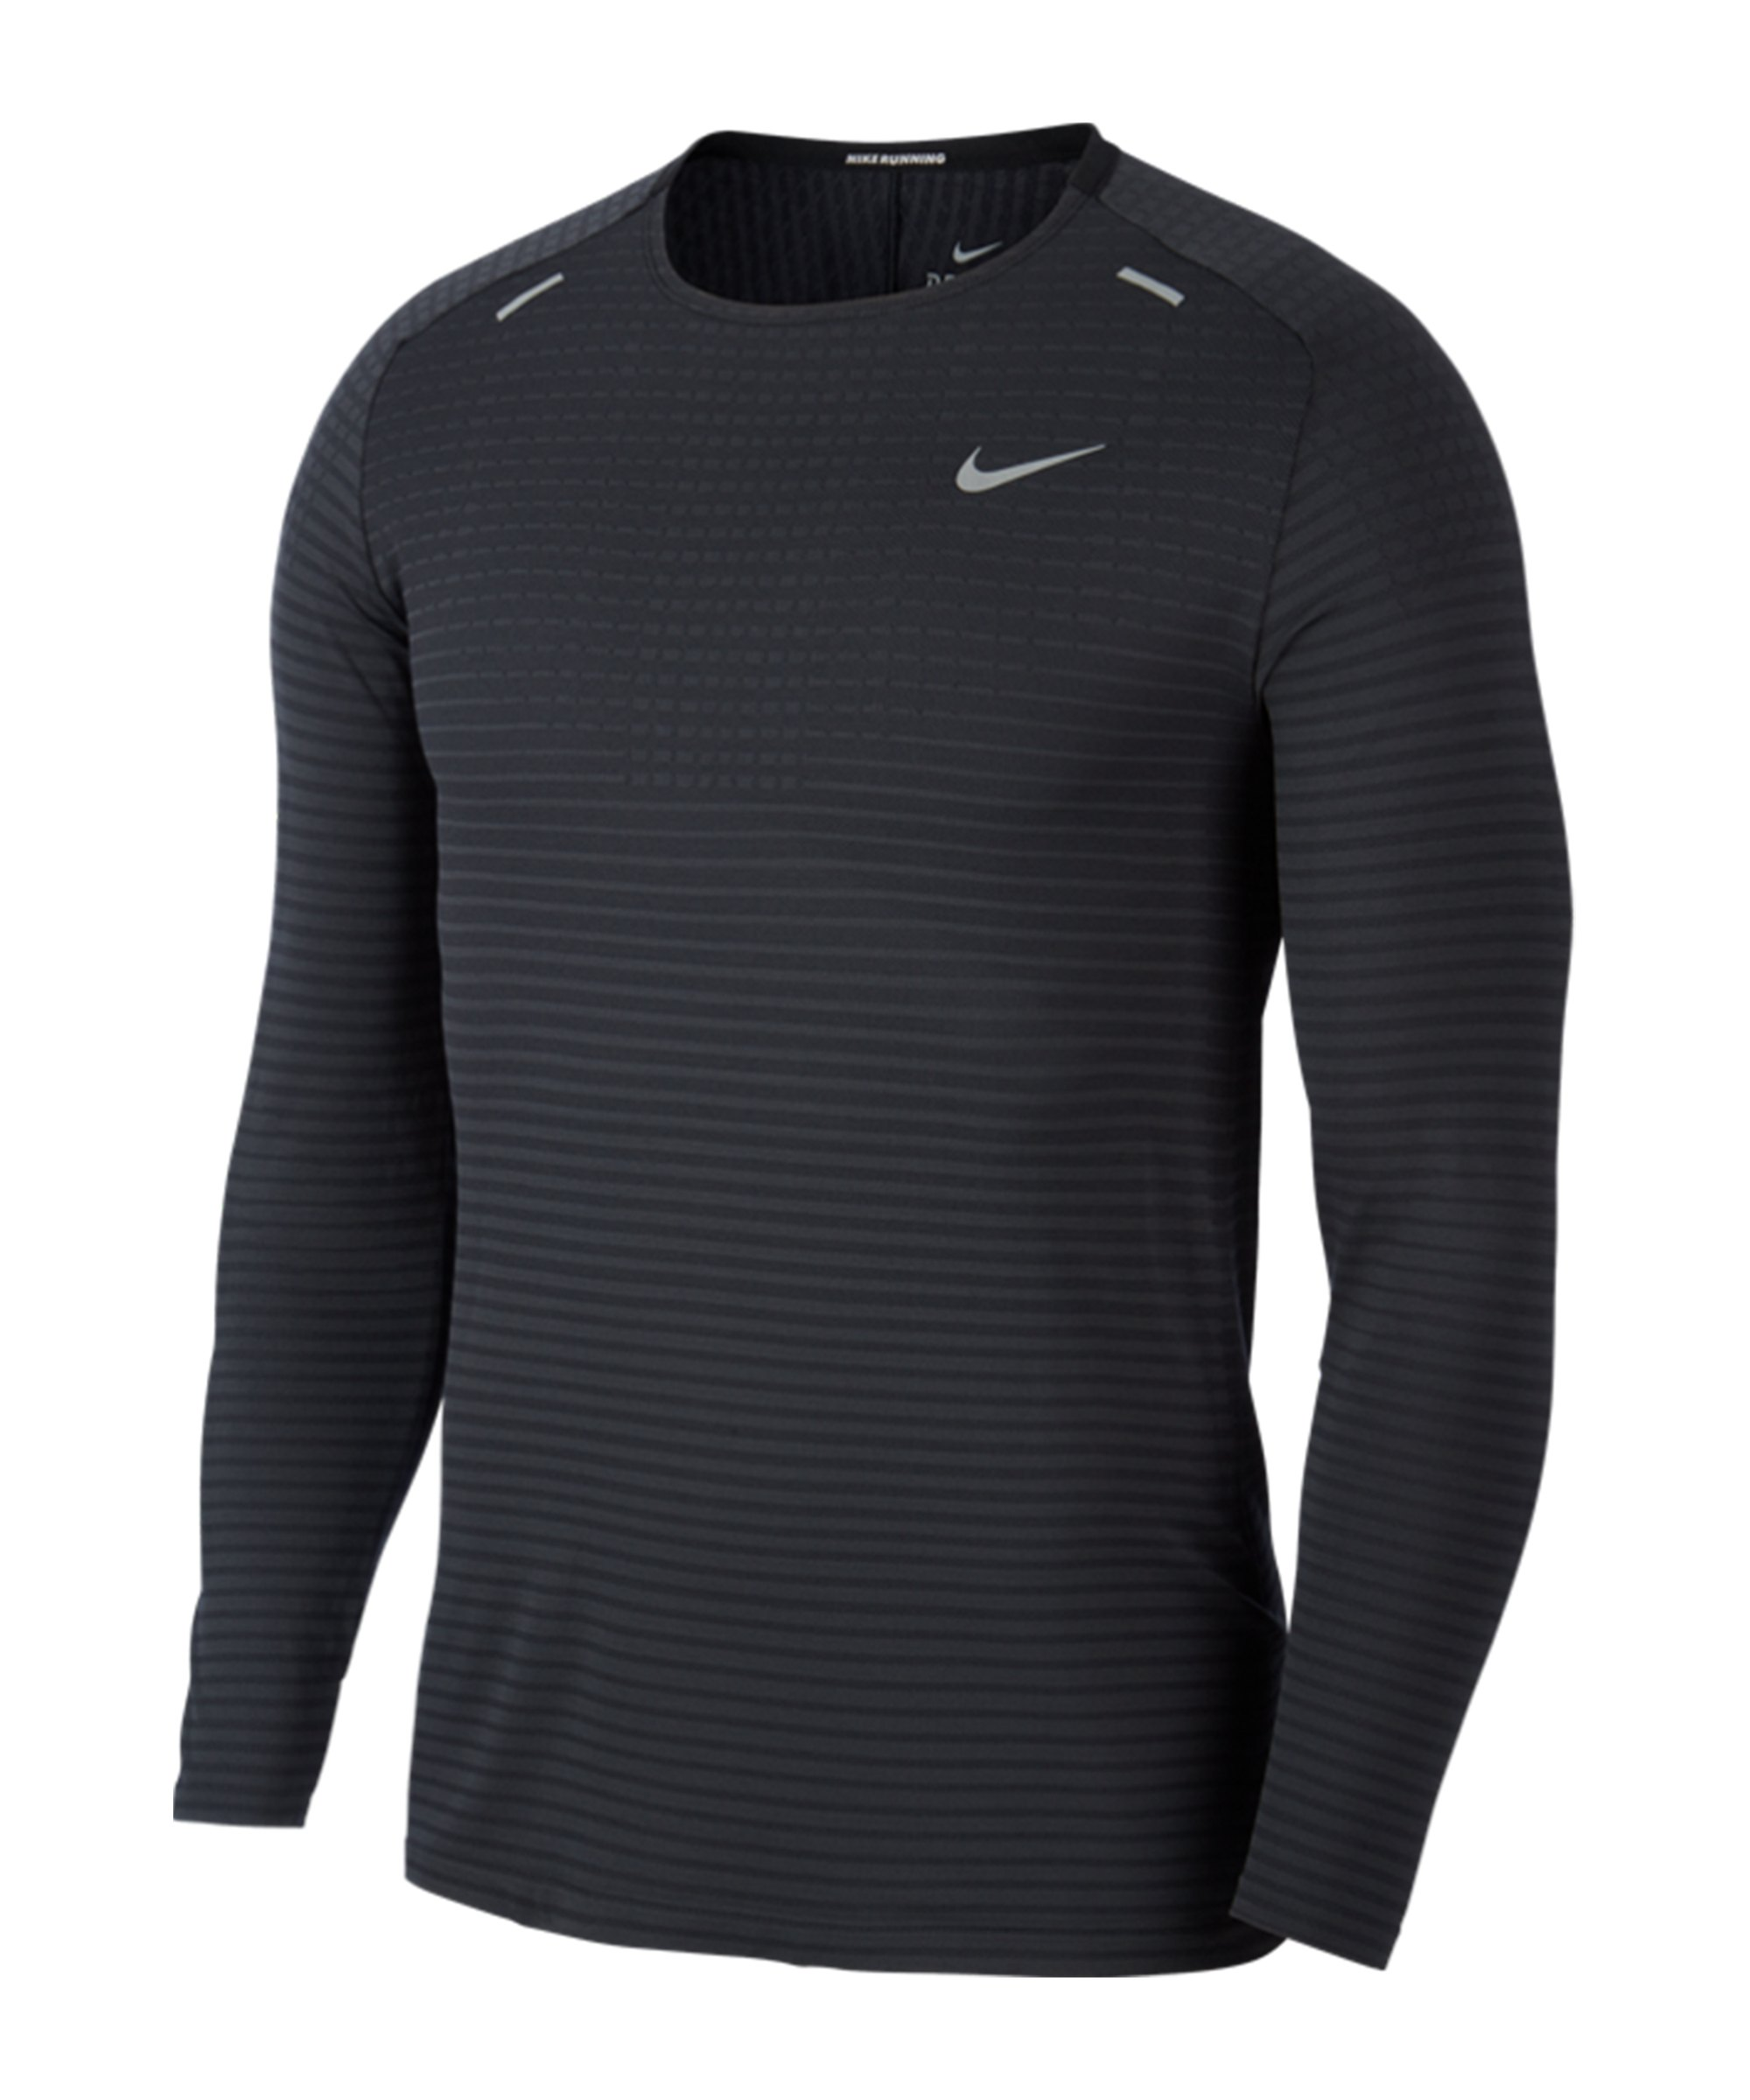 Nike Tech Knit Ultra Sweatshirt Running Grau F010 - grau